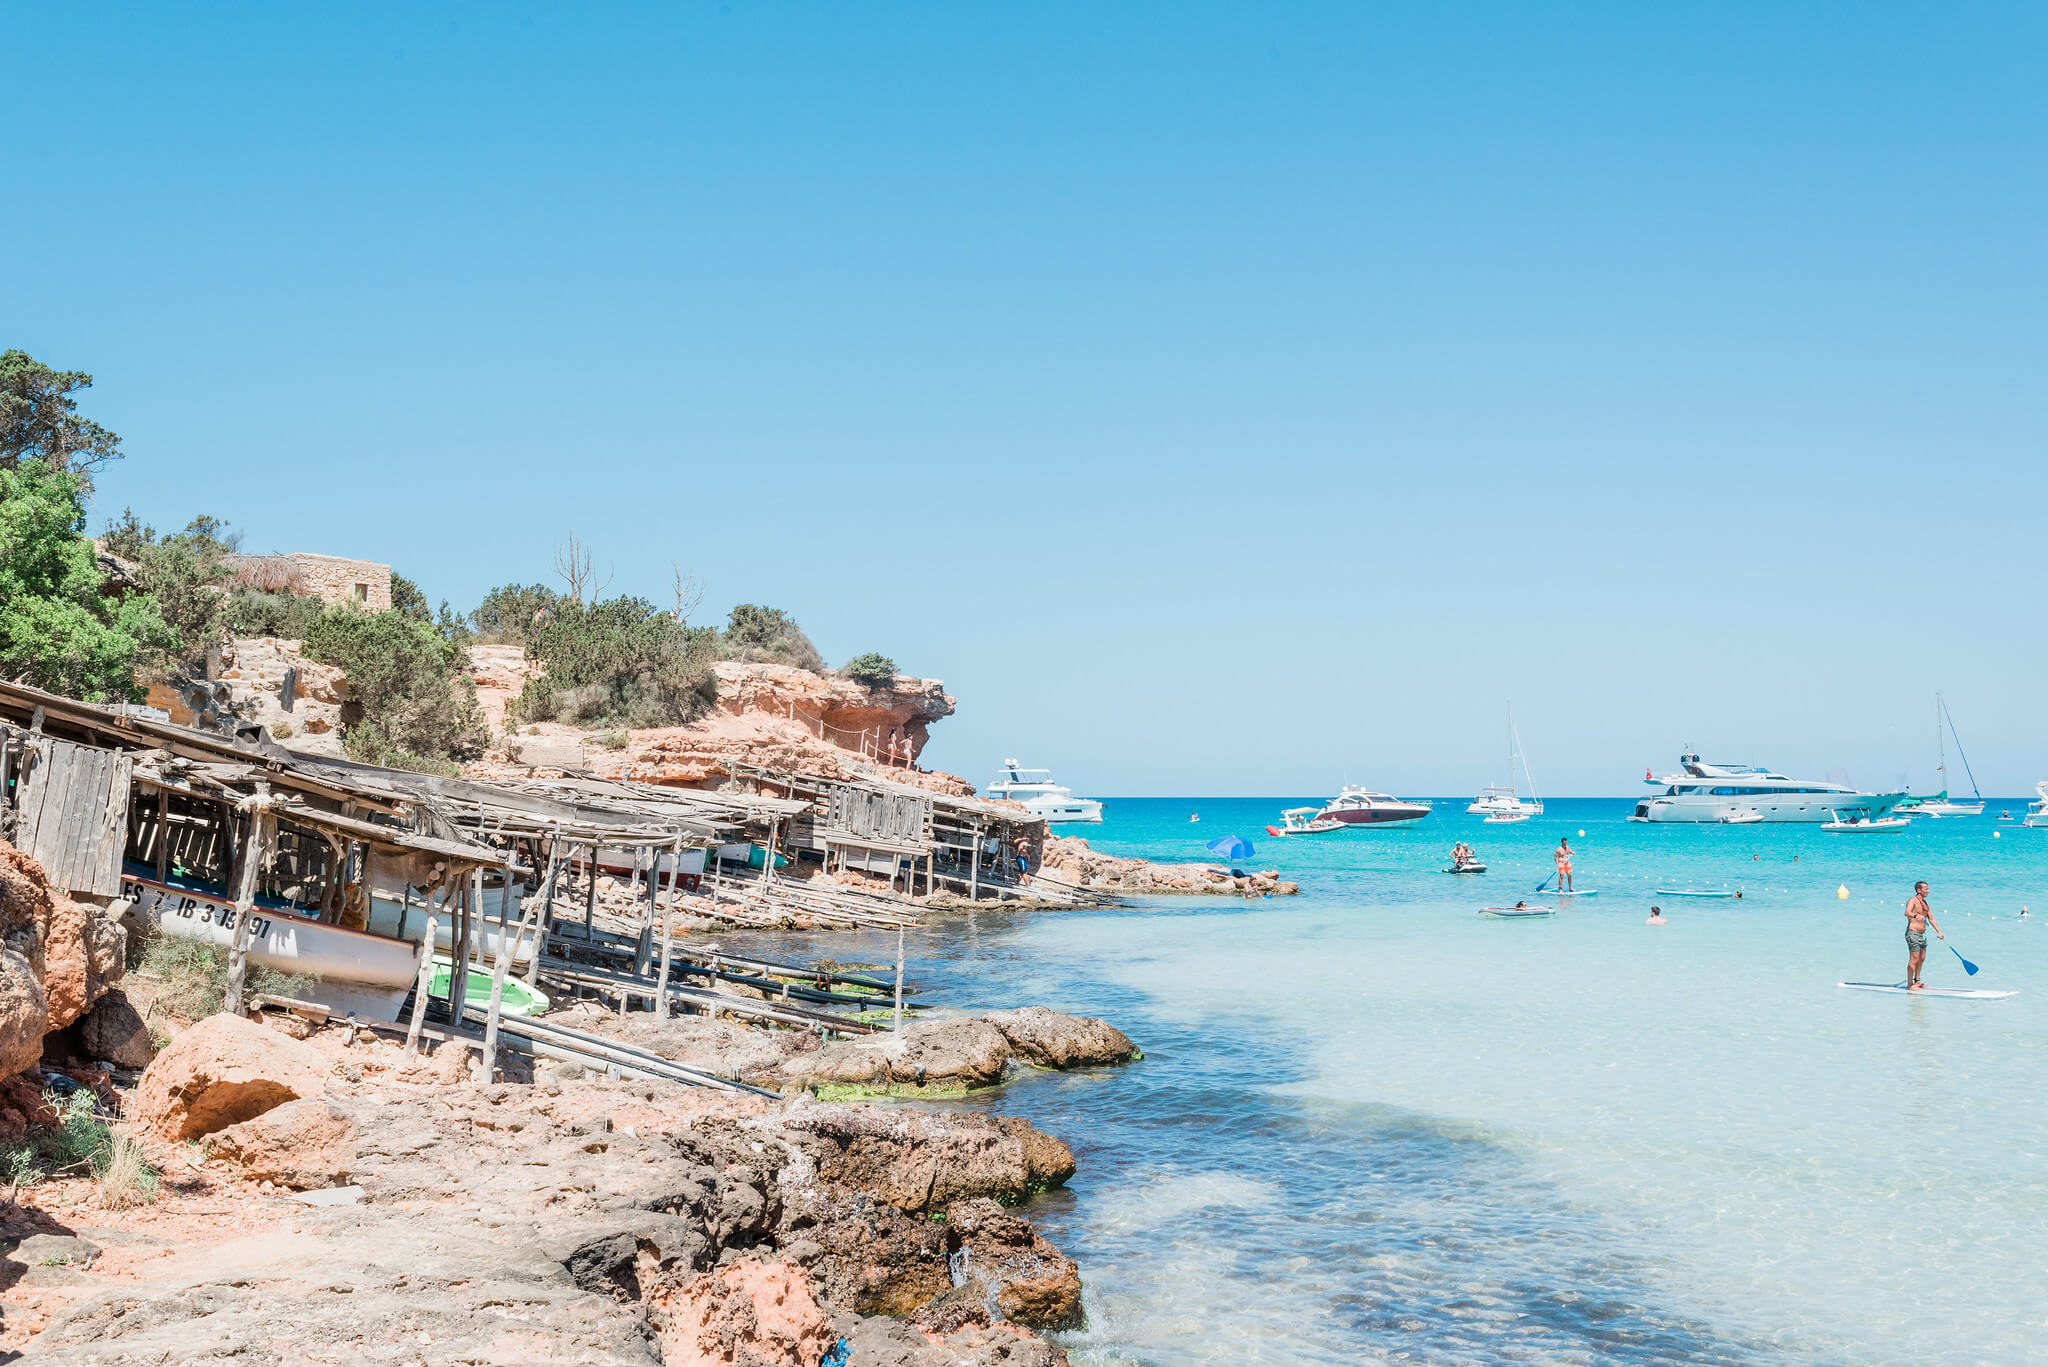 https://www.white-ibiza.com/wp-content/uploads/2020/03/formentera-beaches-cala-saona-2020-02.jpg